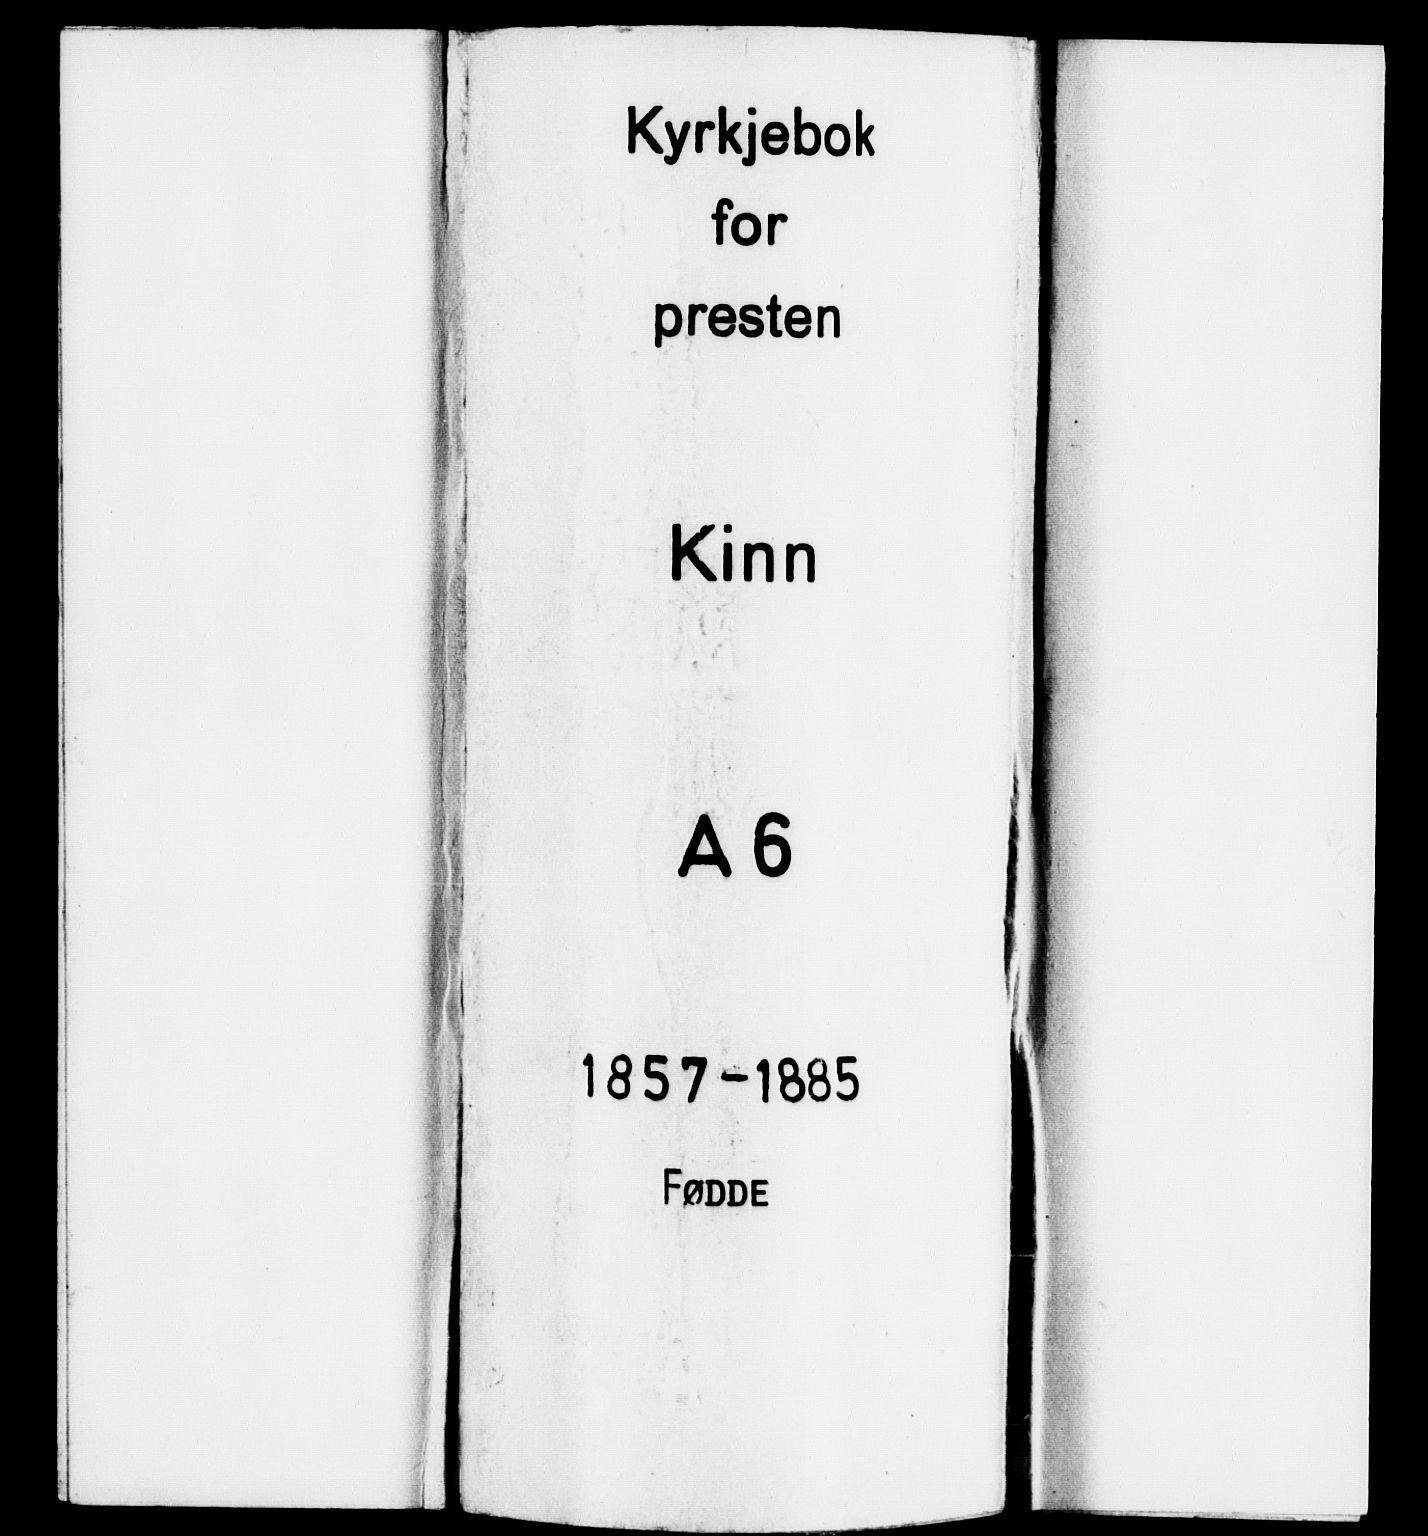 SAB, Kinn sokneprestembete, H/Haa/Haaa/L0006: Parish register (official) no. A 6, 1857-1885